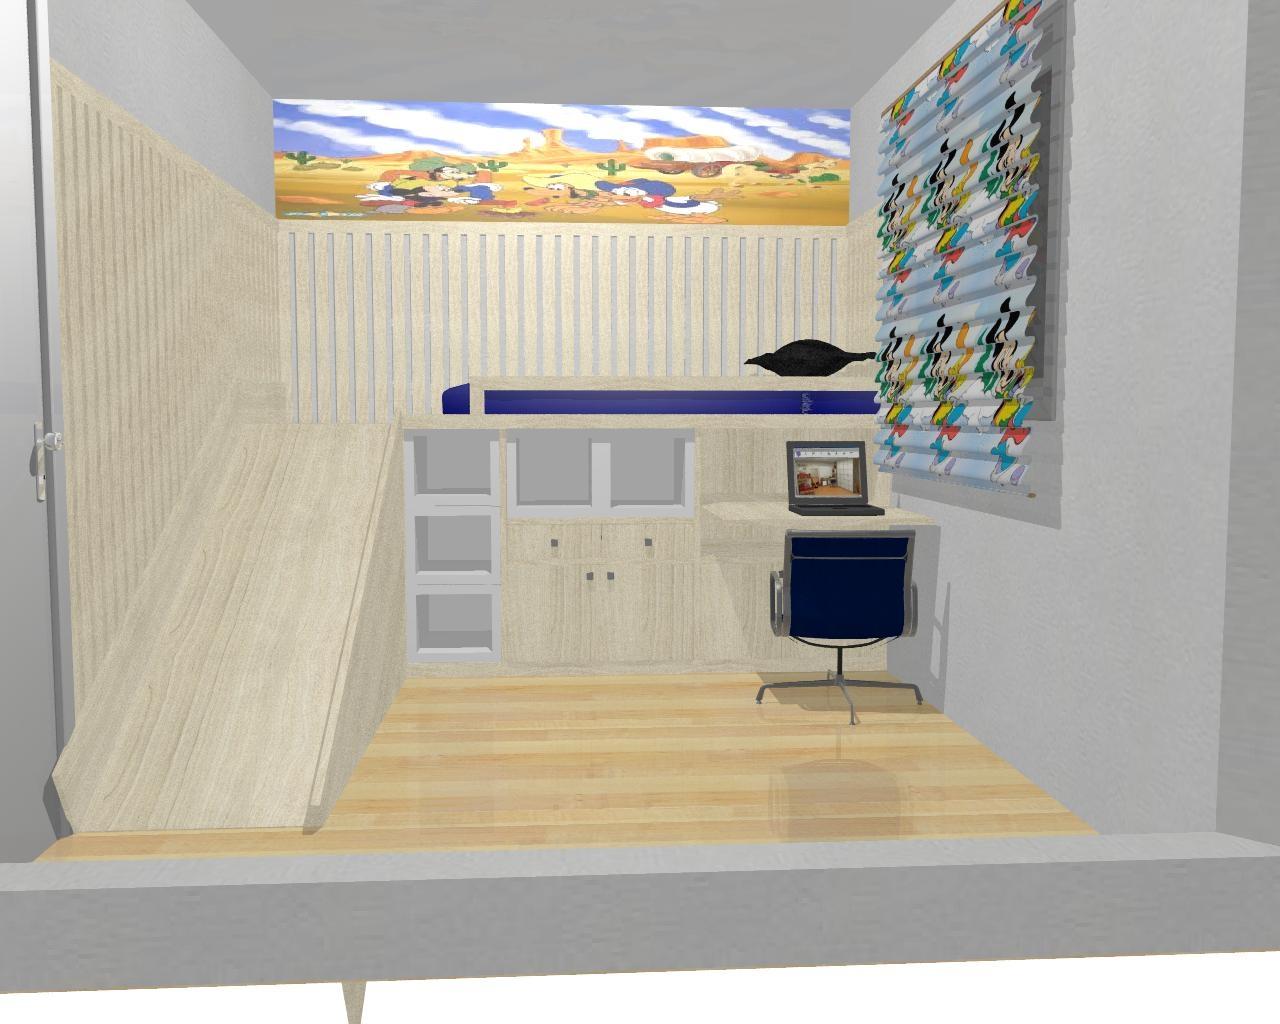 projeto kleber souza arte cozinhas italínea projeto kleber souza arte  #34757D 1280 1024